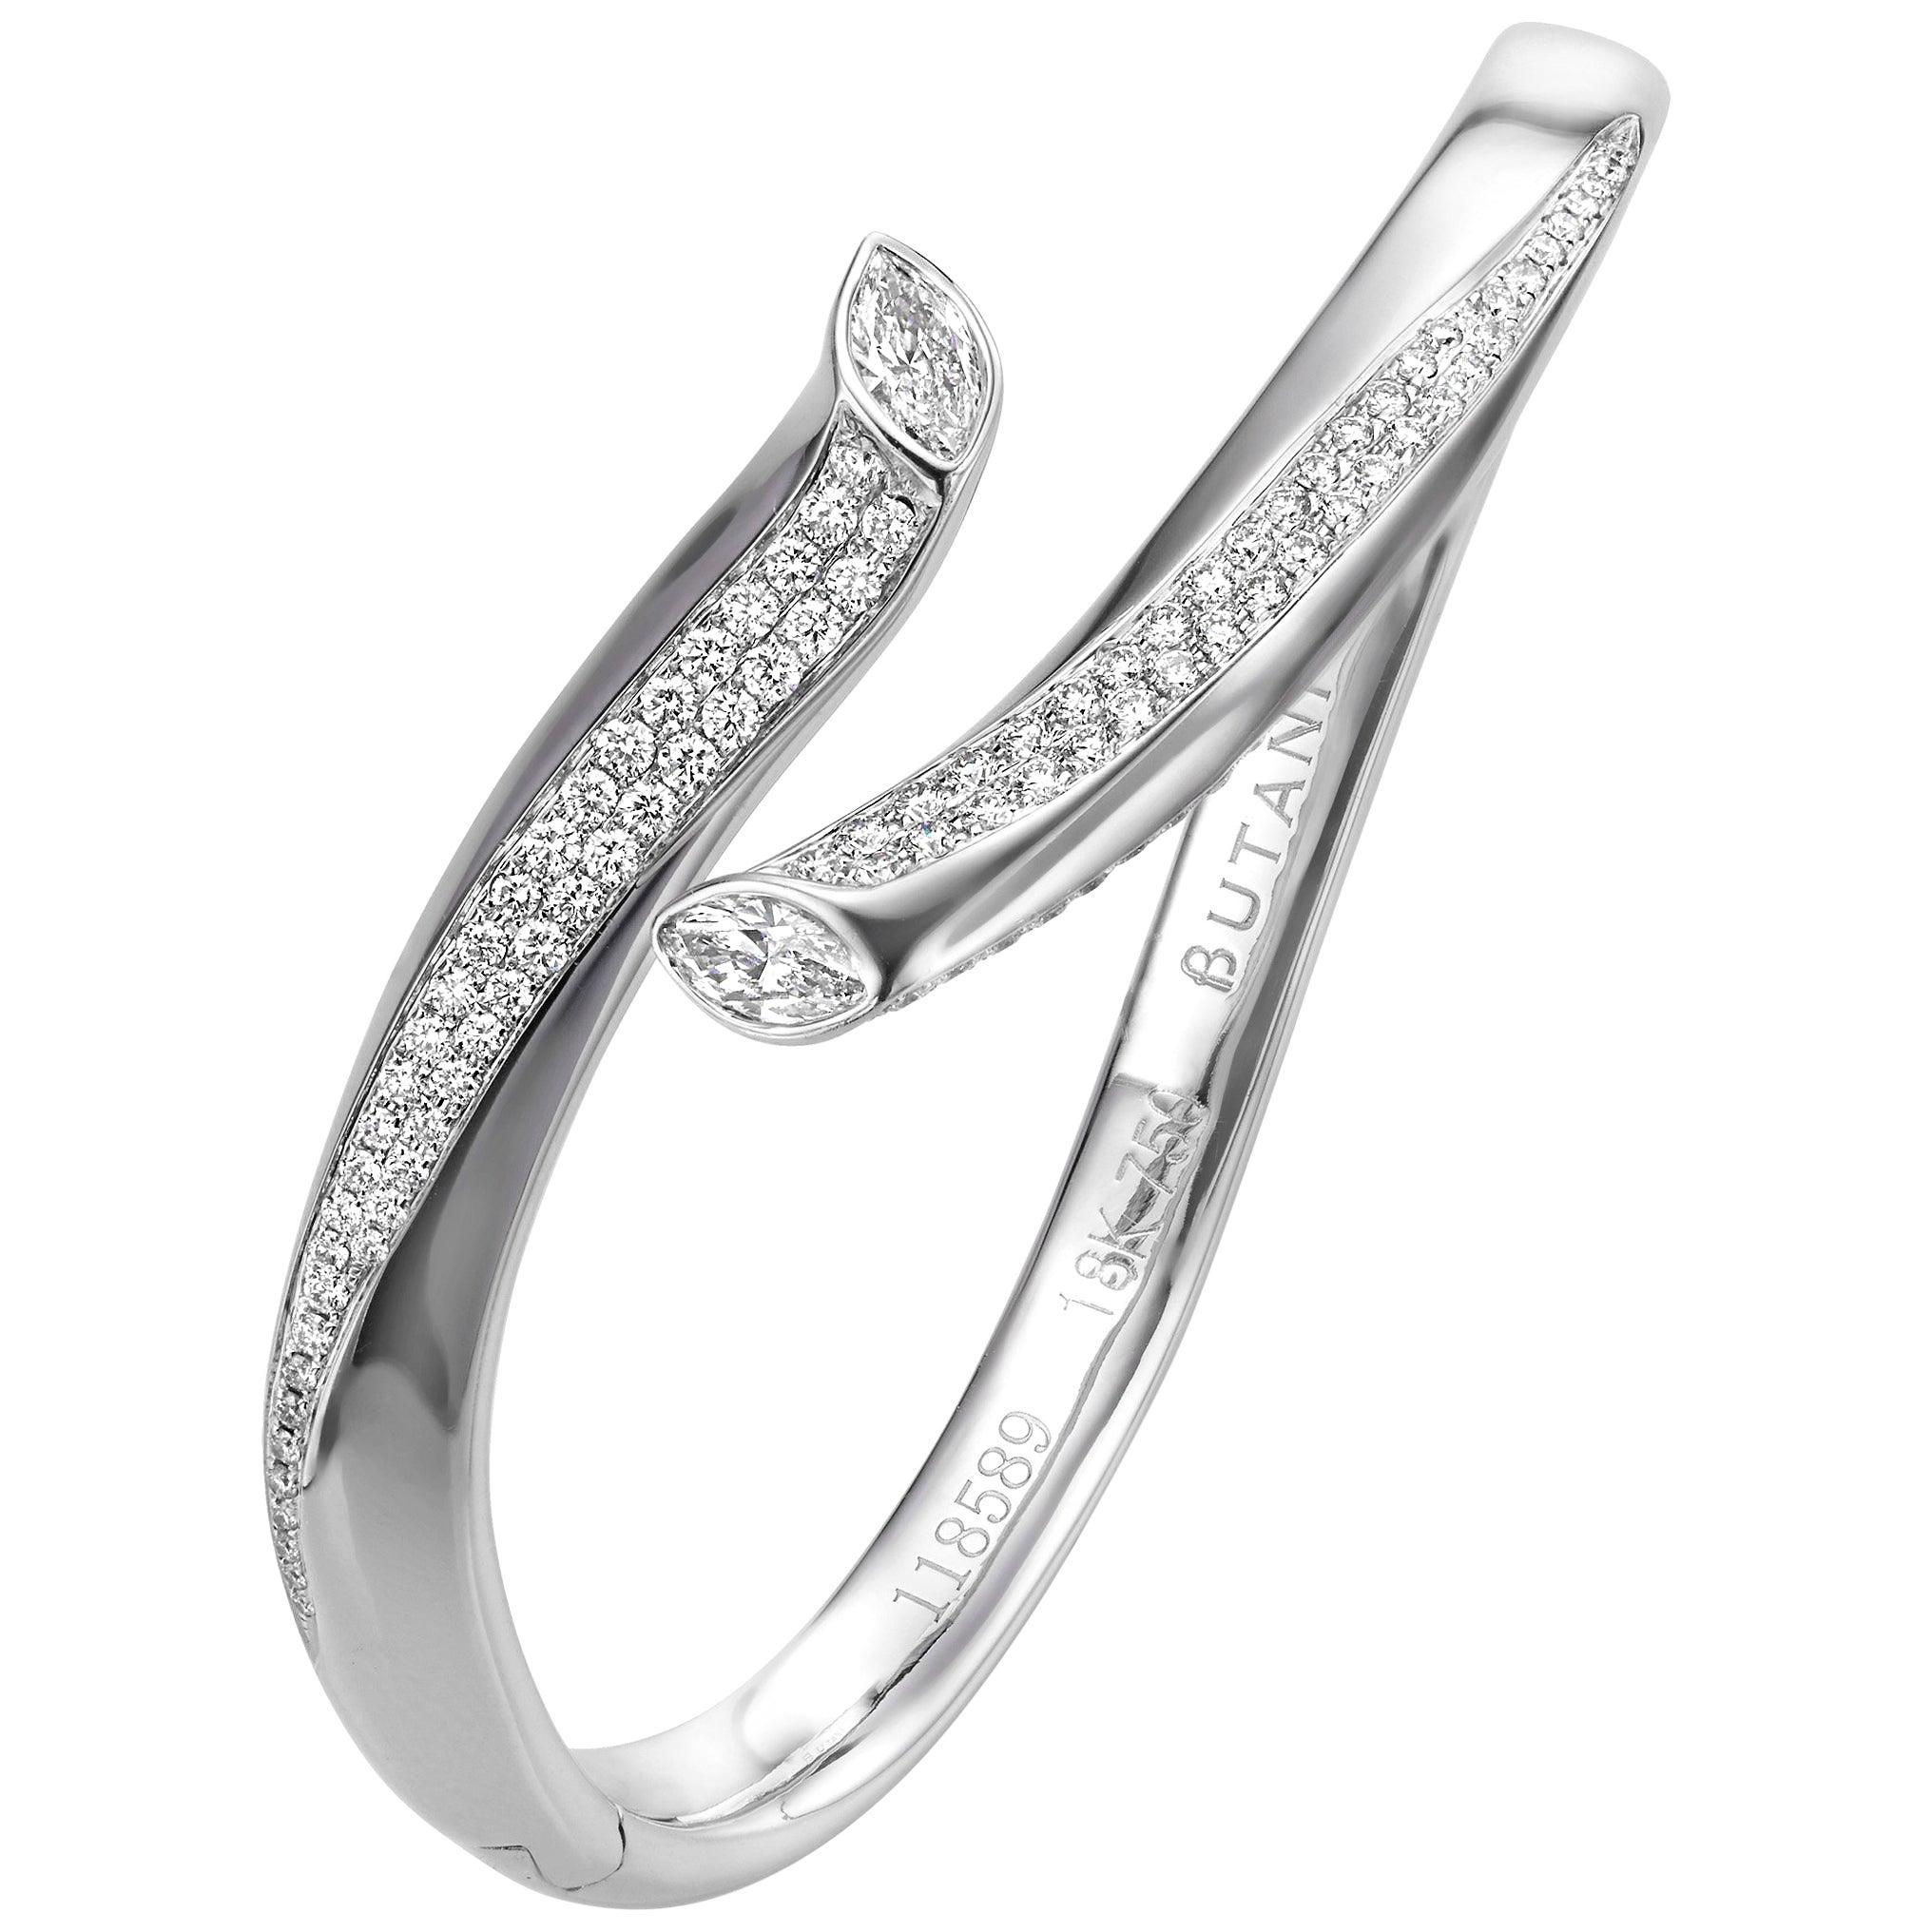 2.21 Carat Marquise Round Diamond 18 Karat White Gold Bangle Bracelet